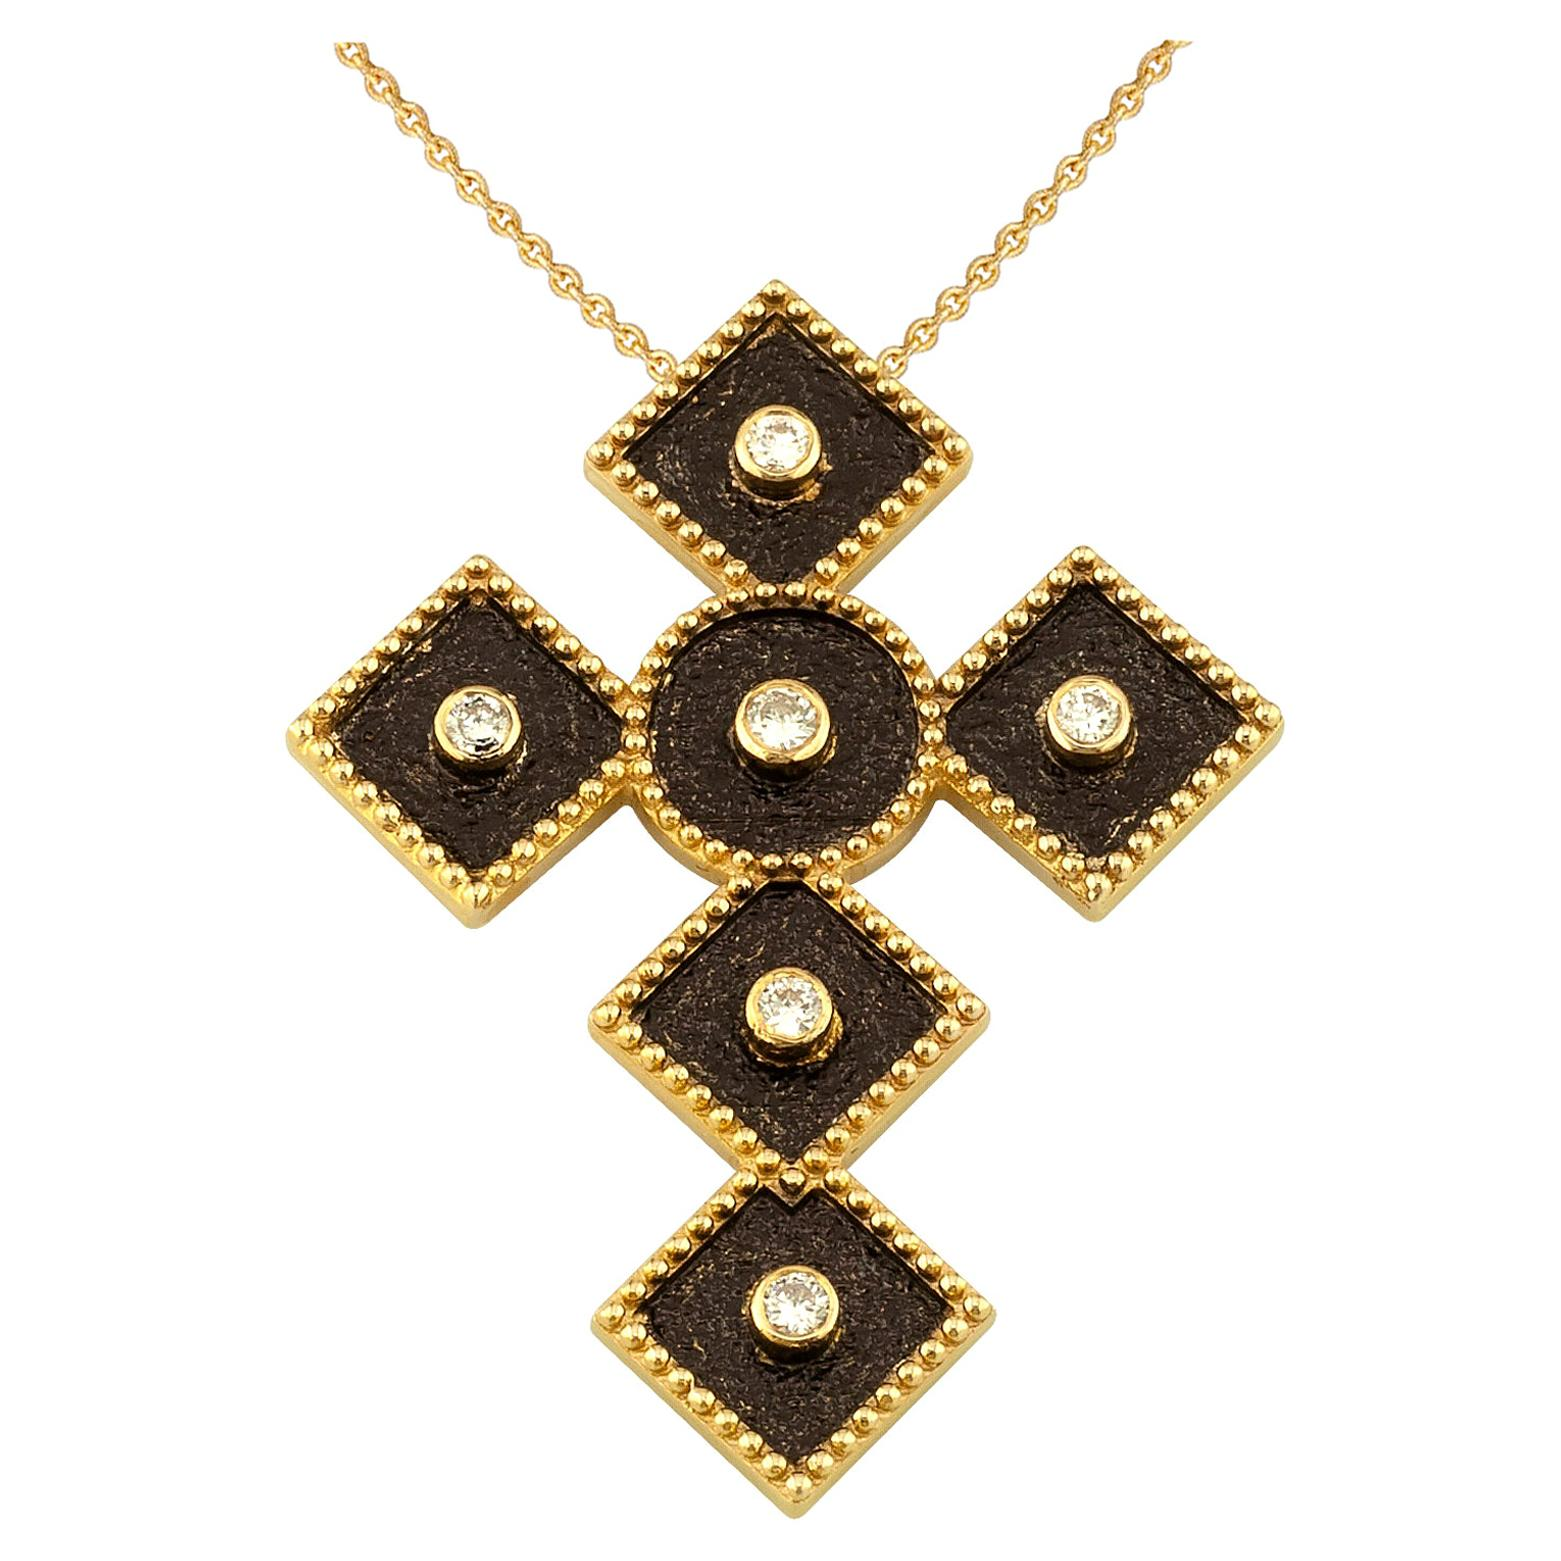 Georgios Collections 18 Karat Two-Tone Gold Diamond Cross Pendant with Chain